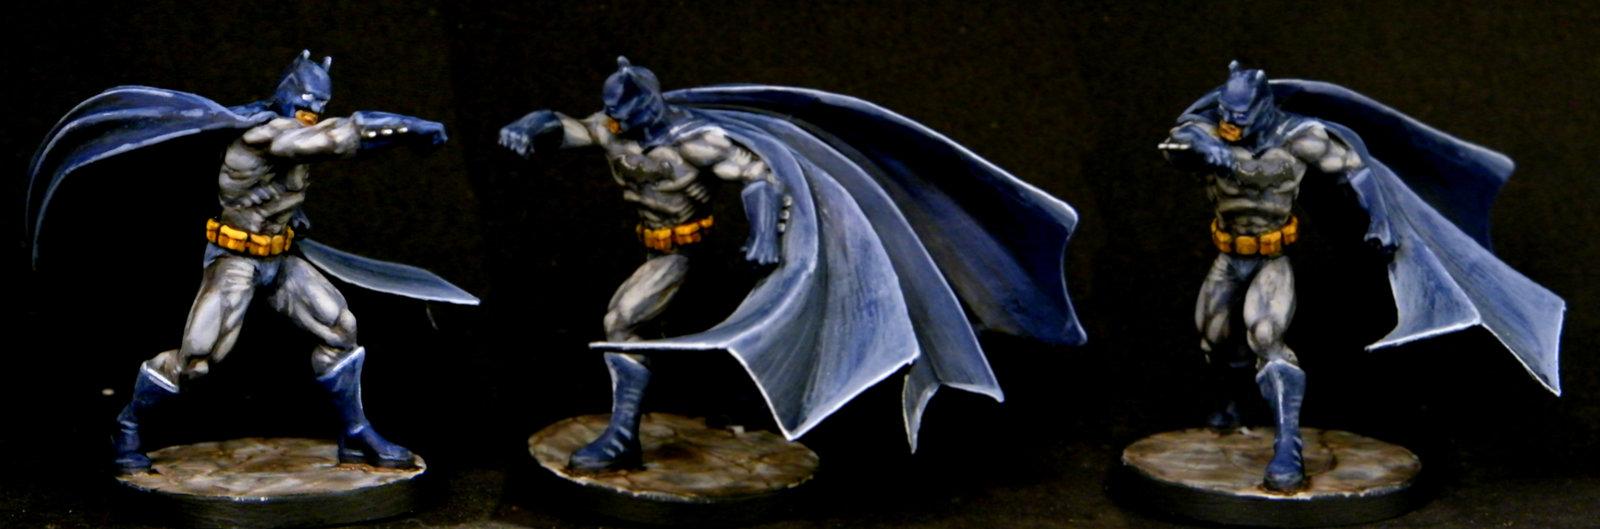 large.Batman2.JPG.27320a8bea49dd5747aa47599445a1f6.JPG